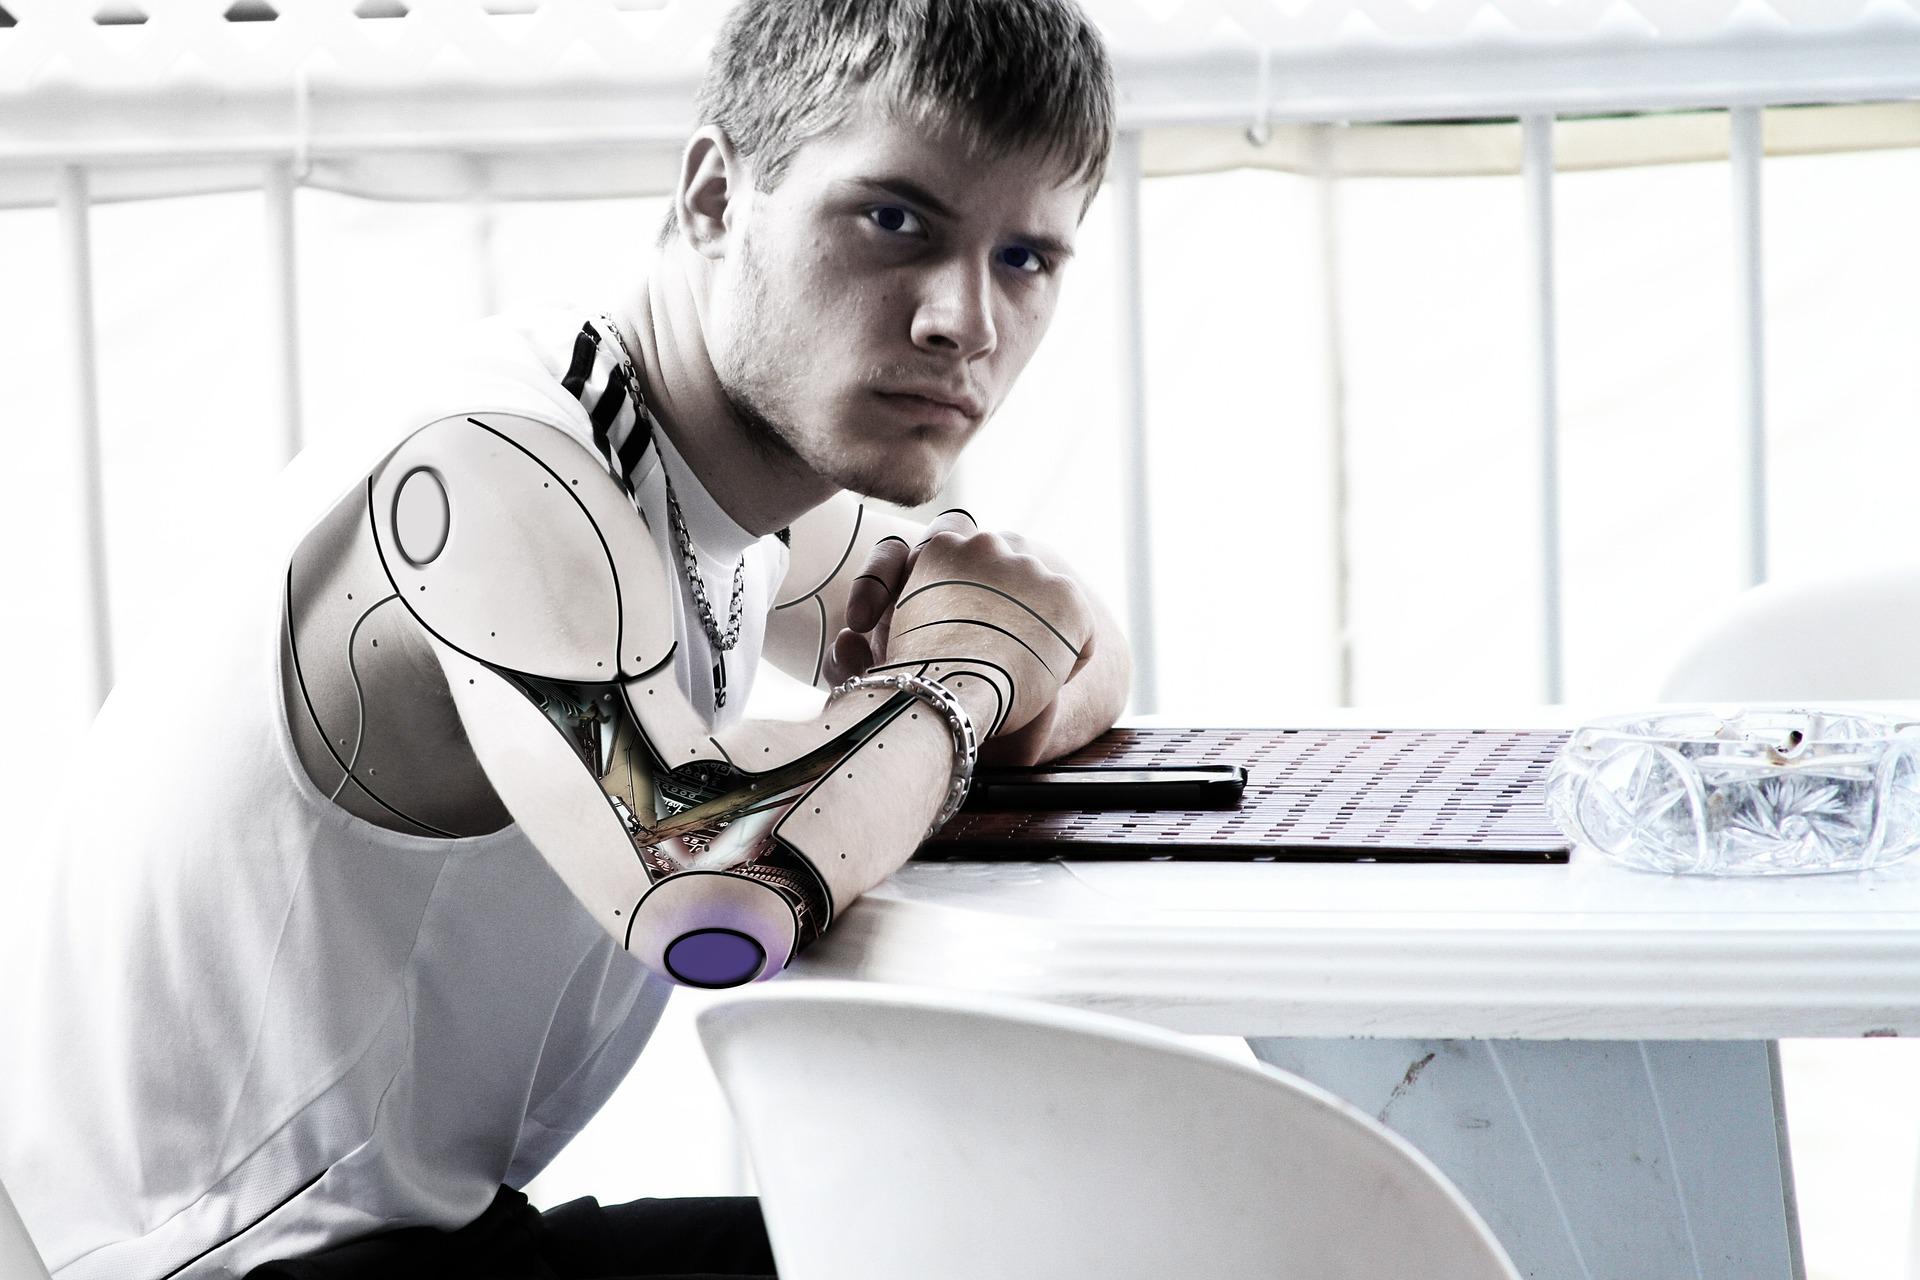 Human Chat Bots Mix